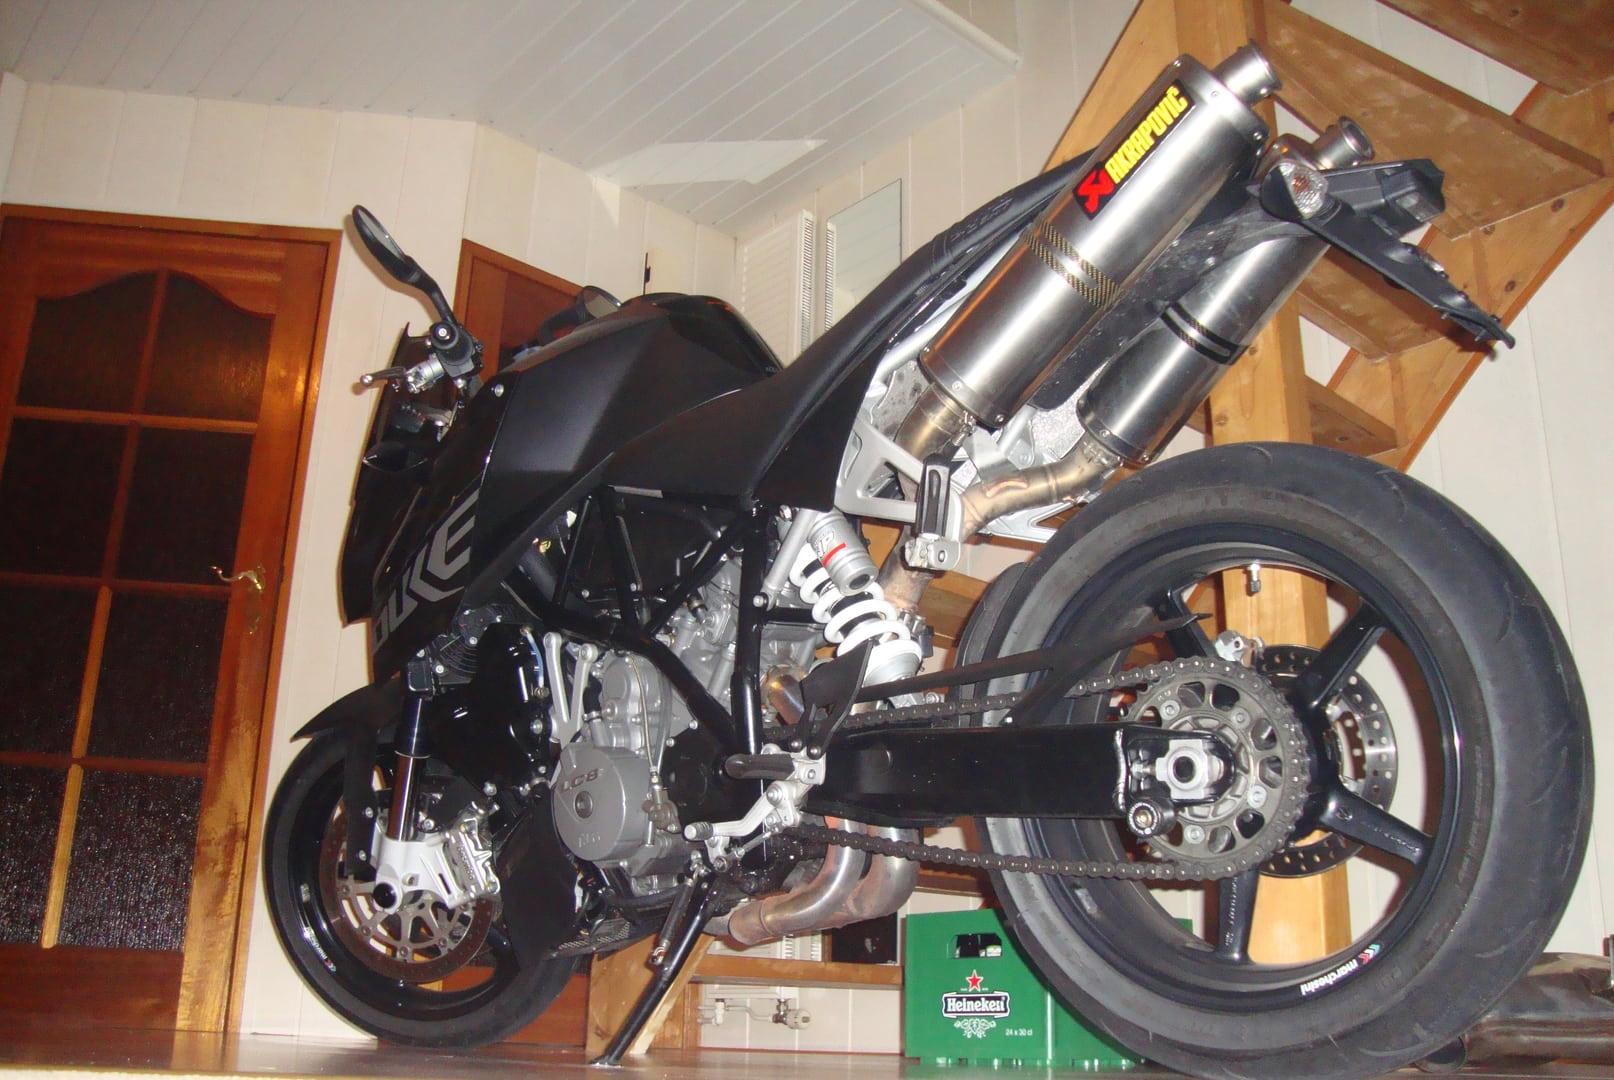 Motor in de woonkamer   algemene motorpraat   motor forum